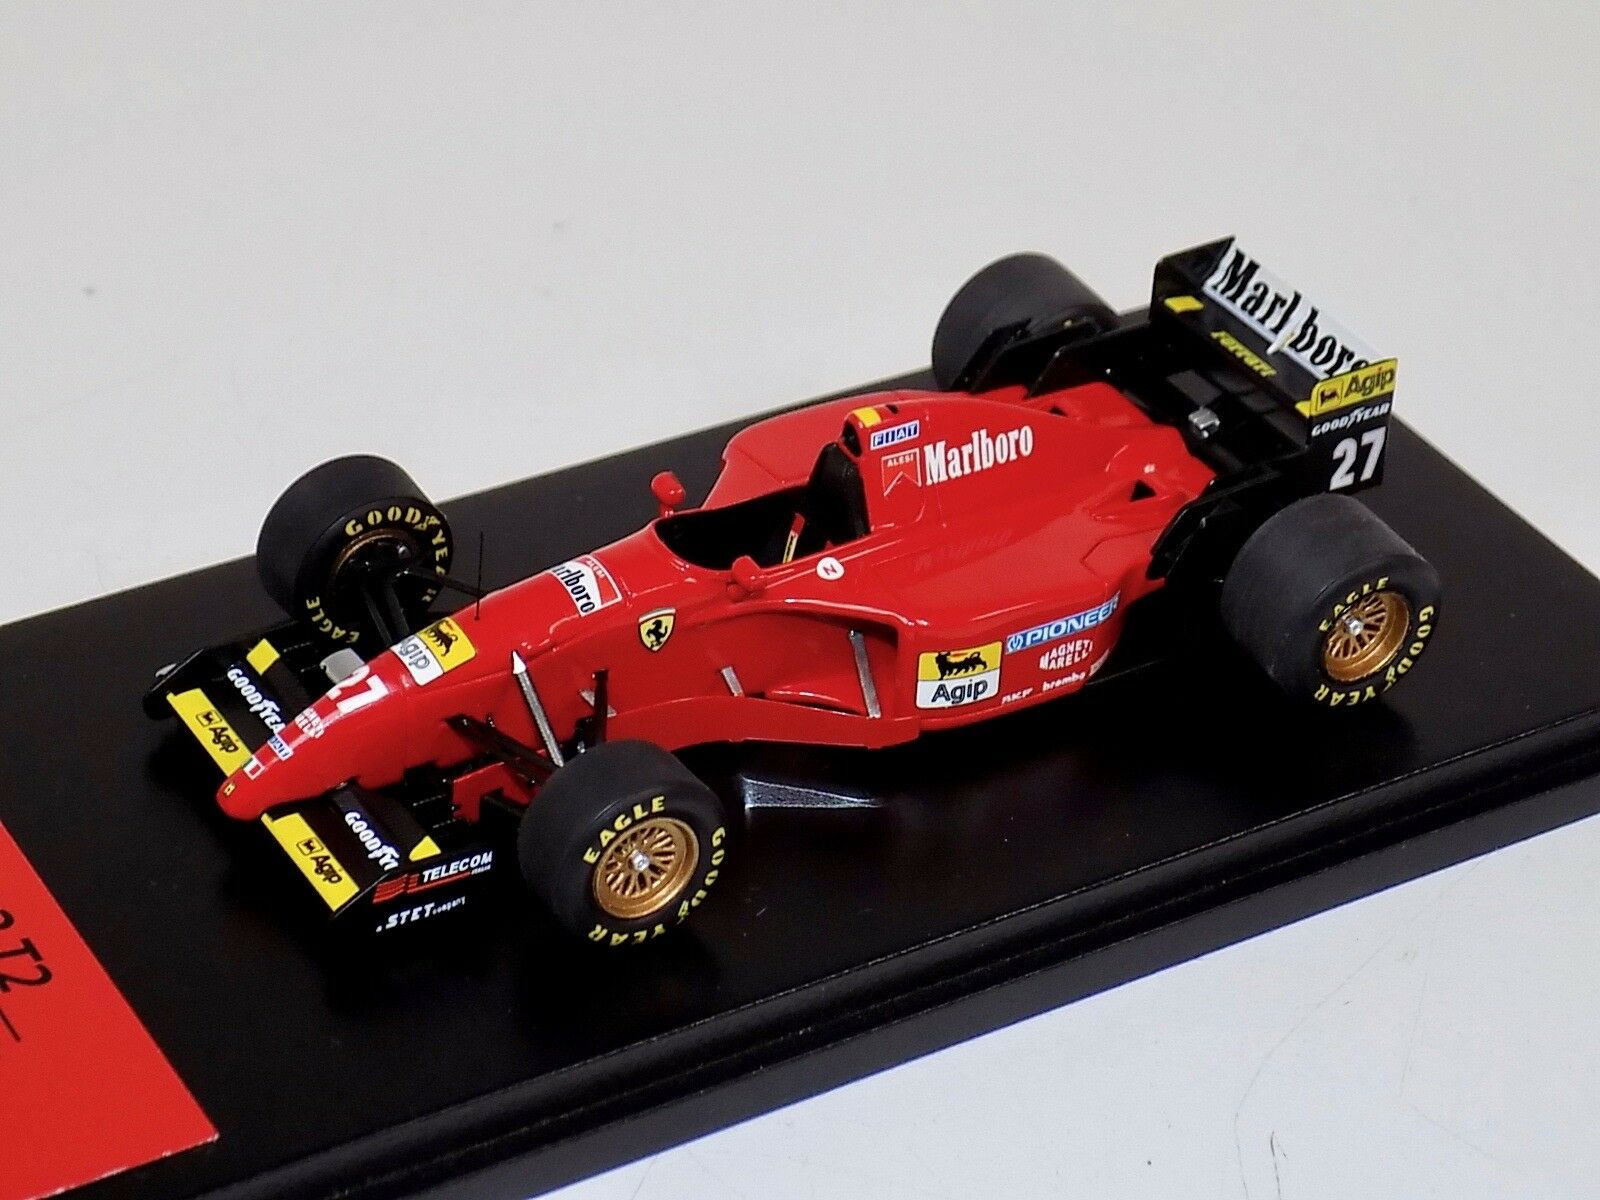 1/43 TSM Fujimi Formula 1 Ferrari 412 T2 1995 Alesi with Marlboro